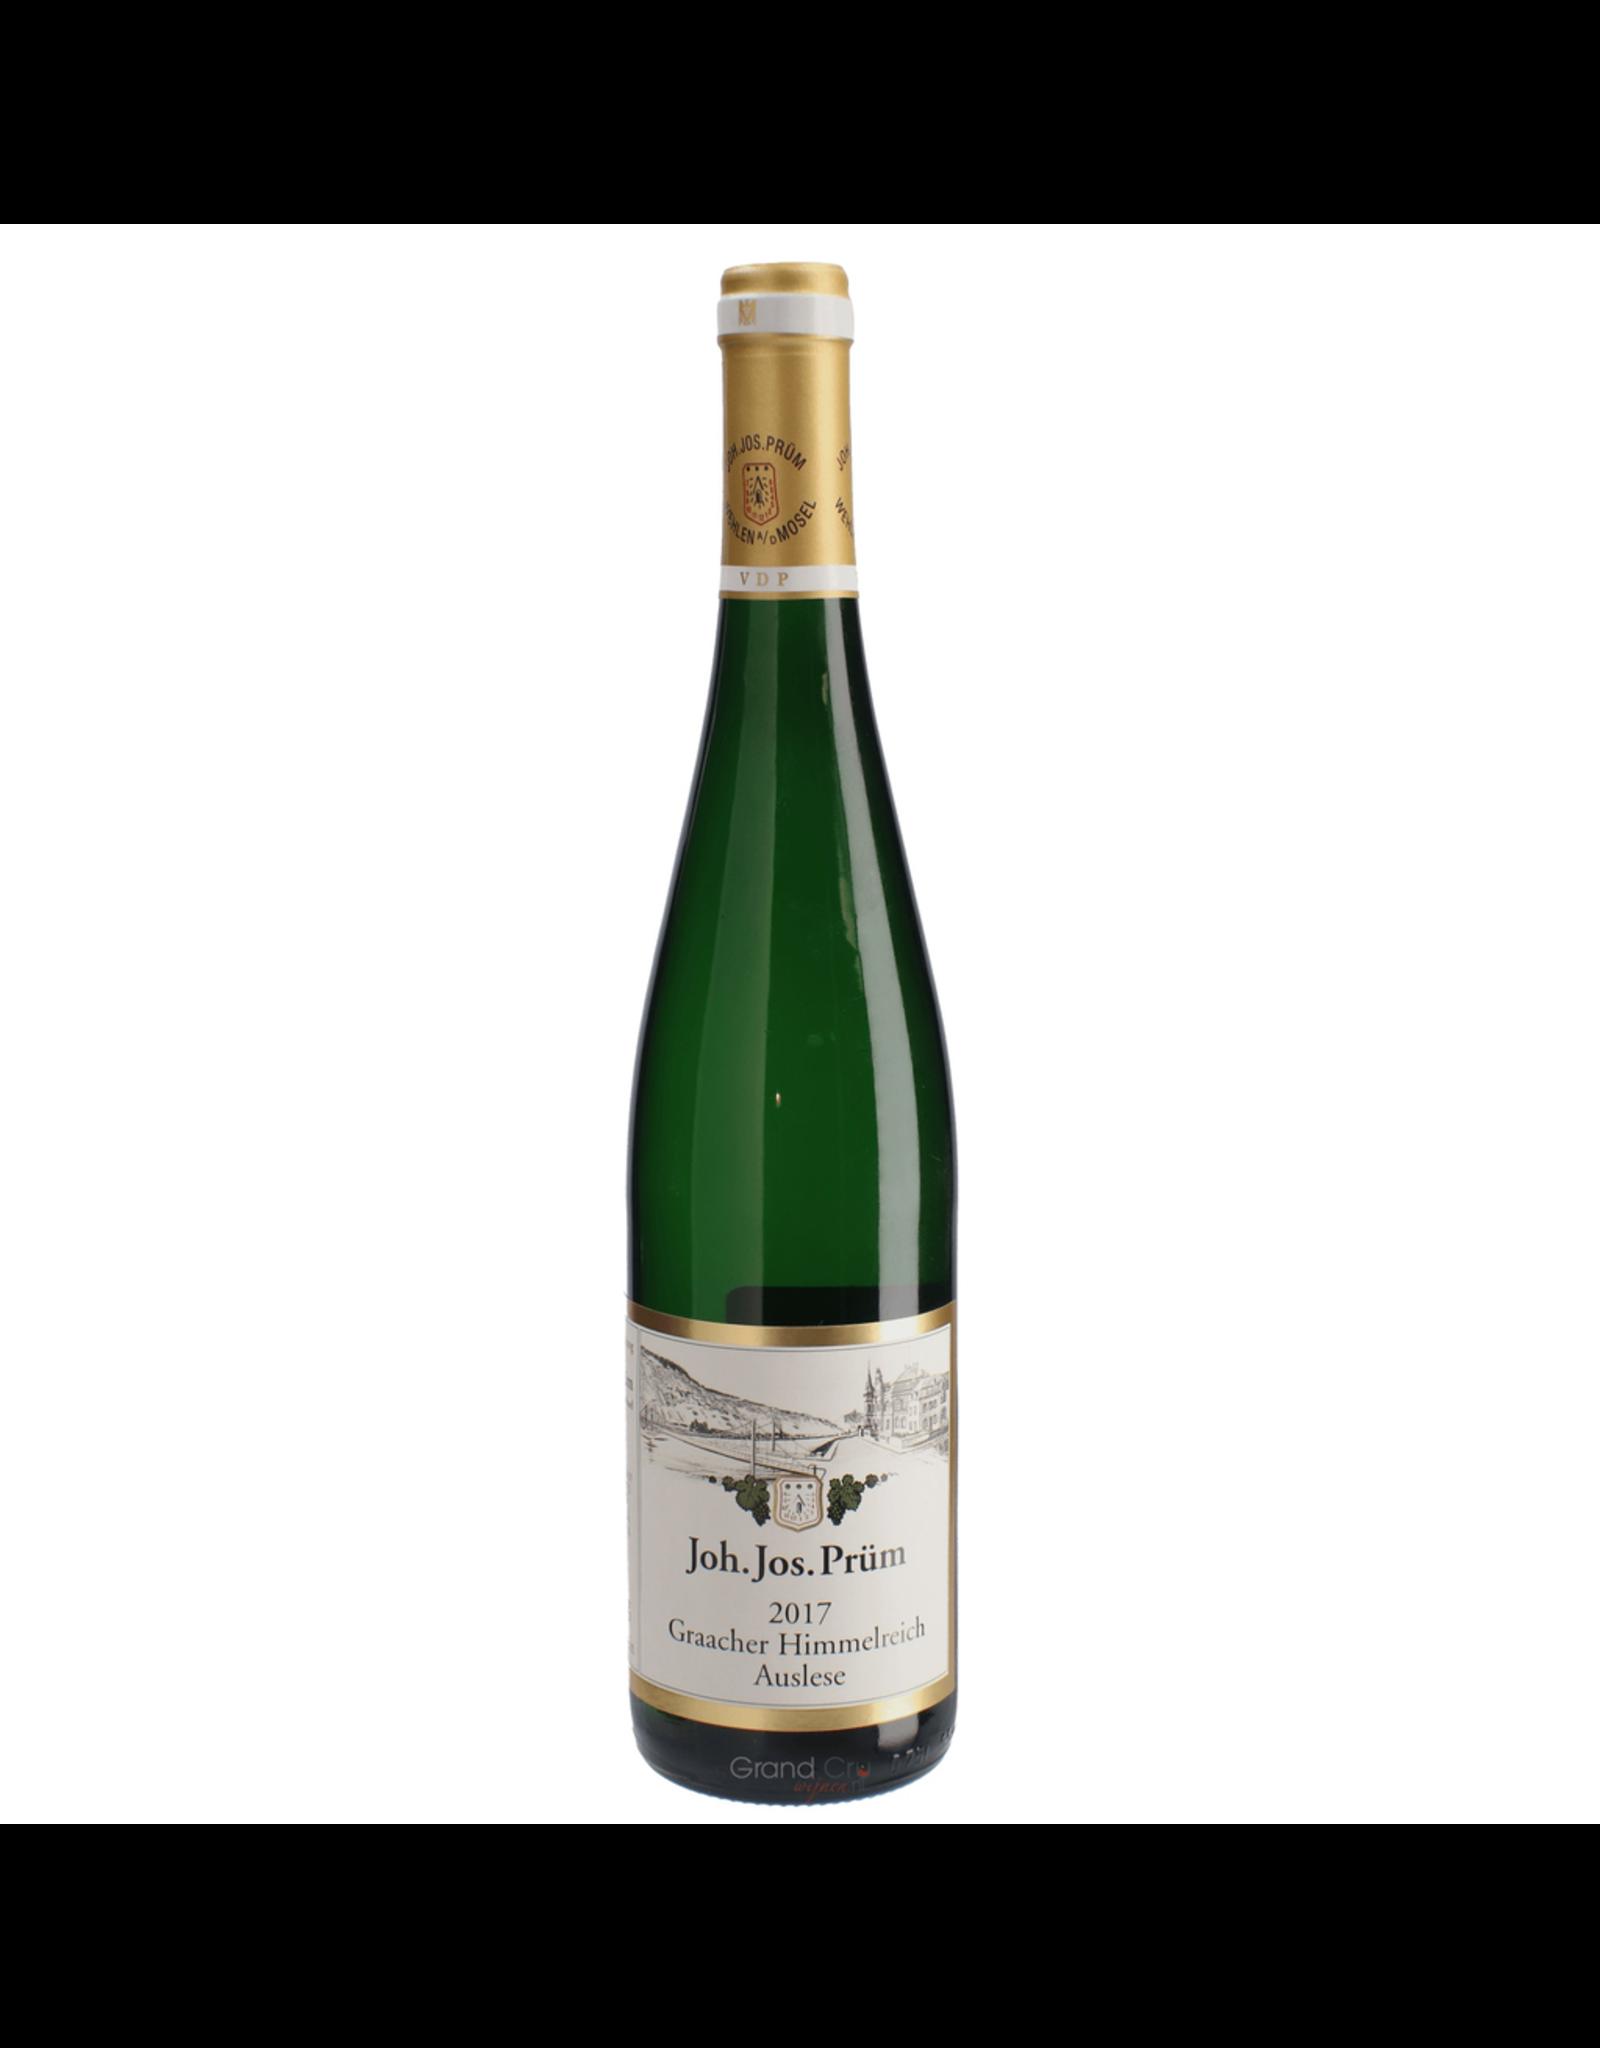 White Wine 2017, Joh. Jos. Prum Gaacher Himmelreich GOLD CAP 750ml Auslese, Riesling, Gaacher Himmelreich, Mosel, Germany, 7.5% Alc, CT93 WE96